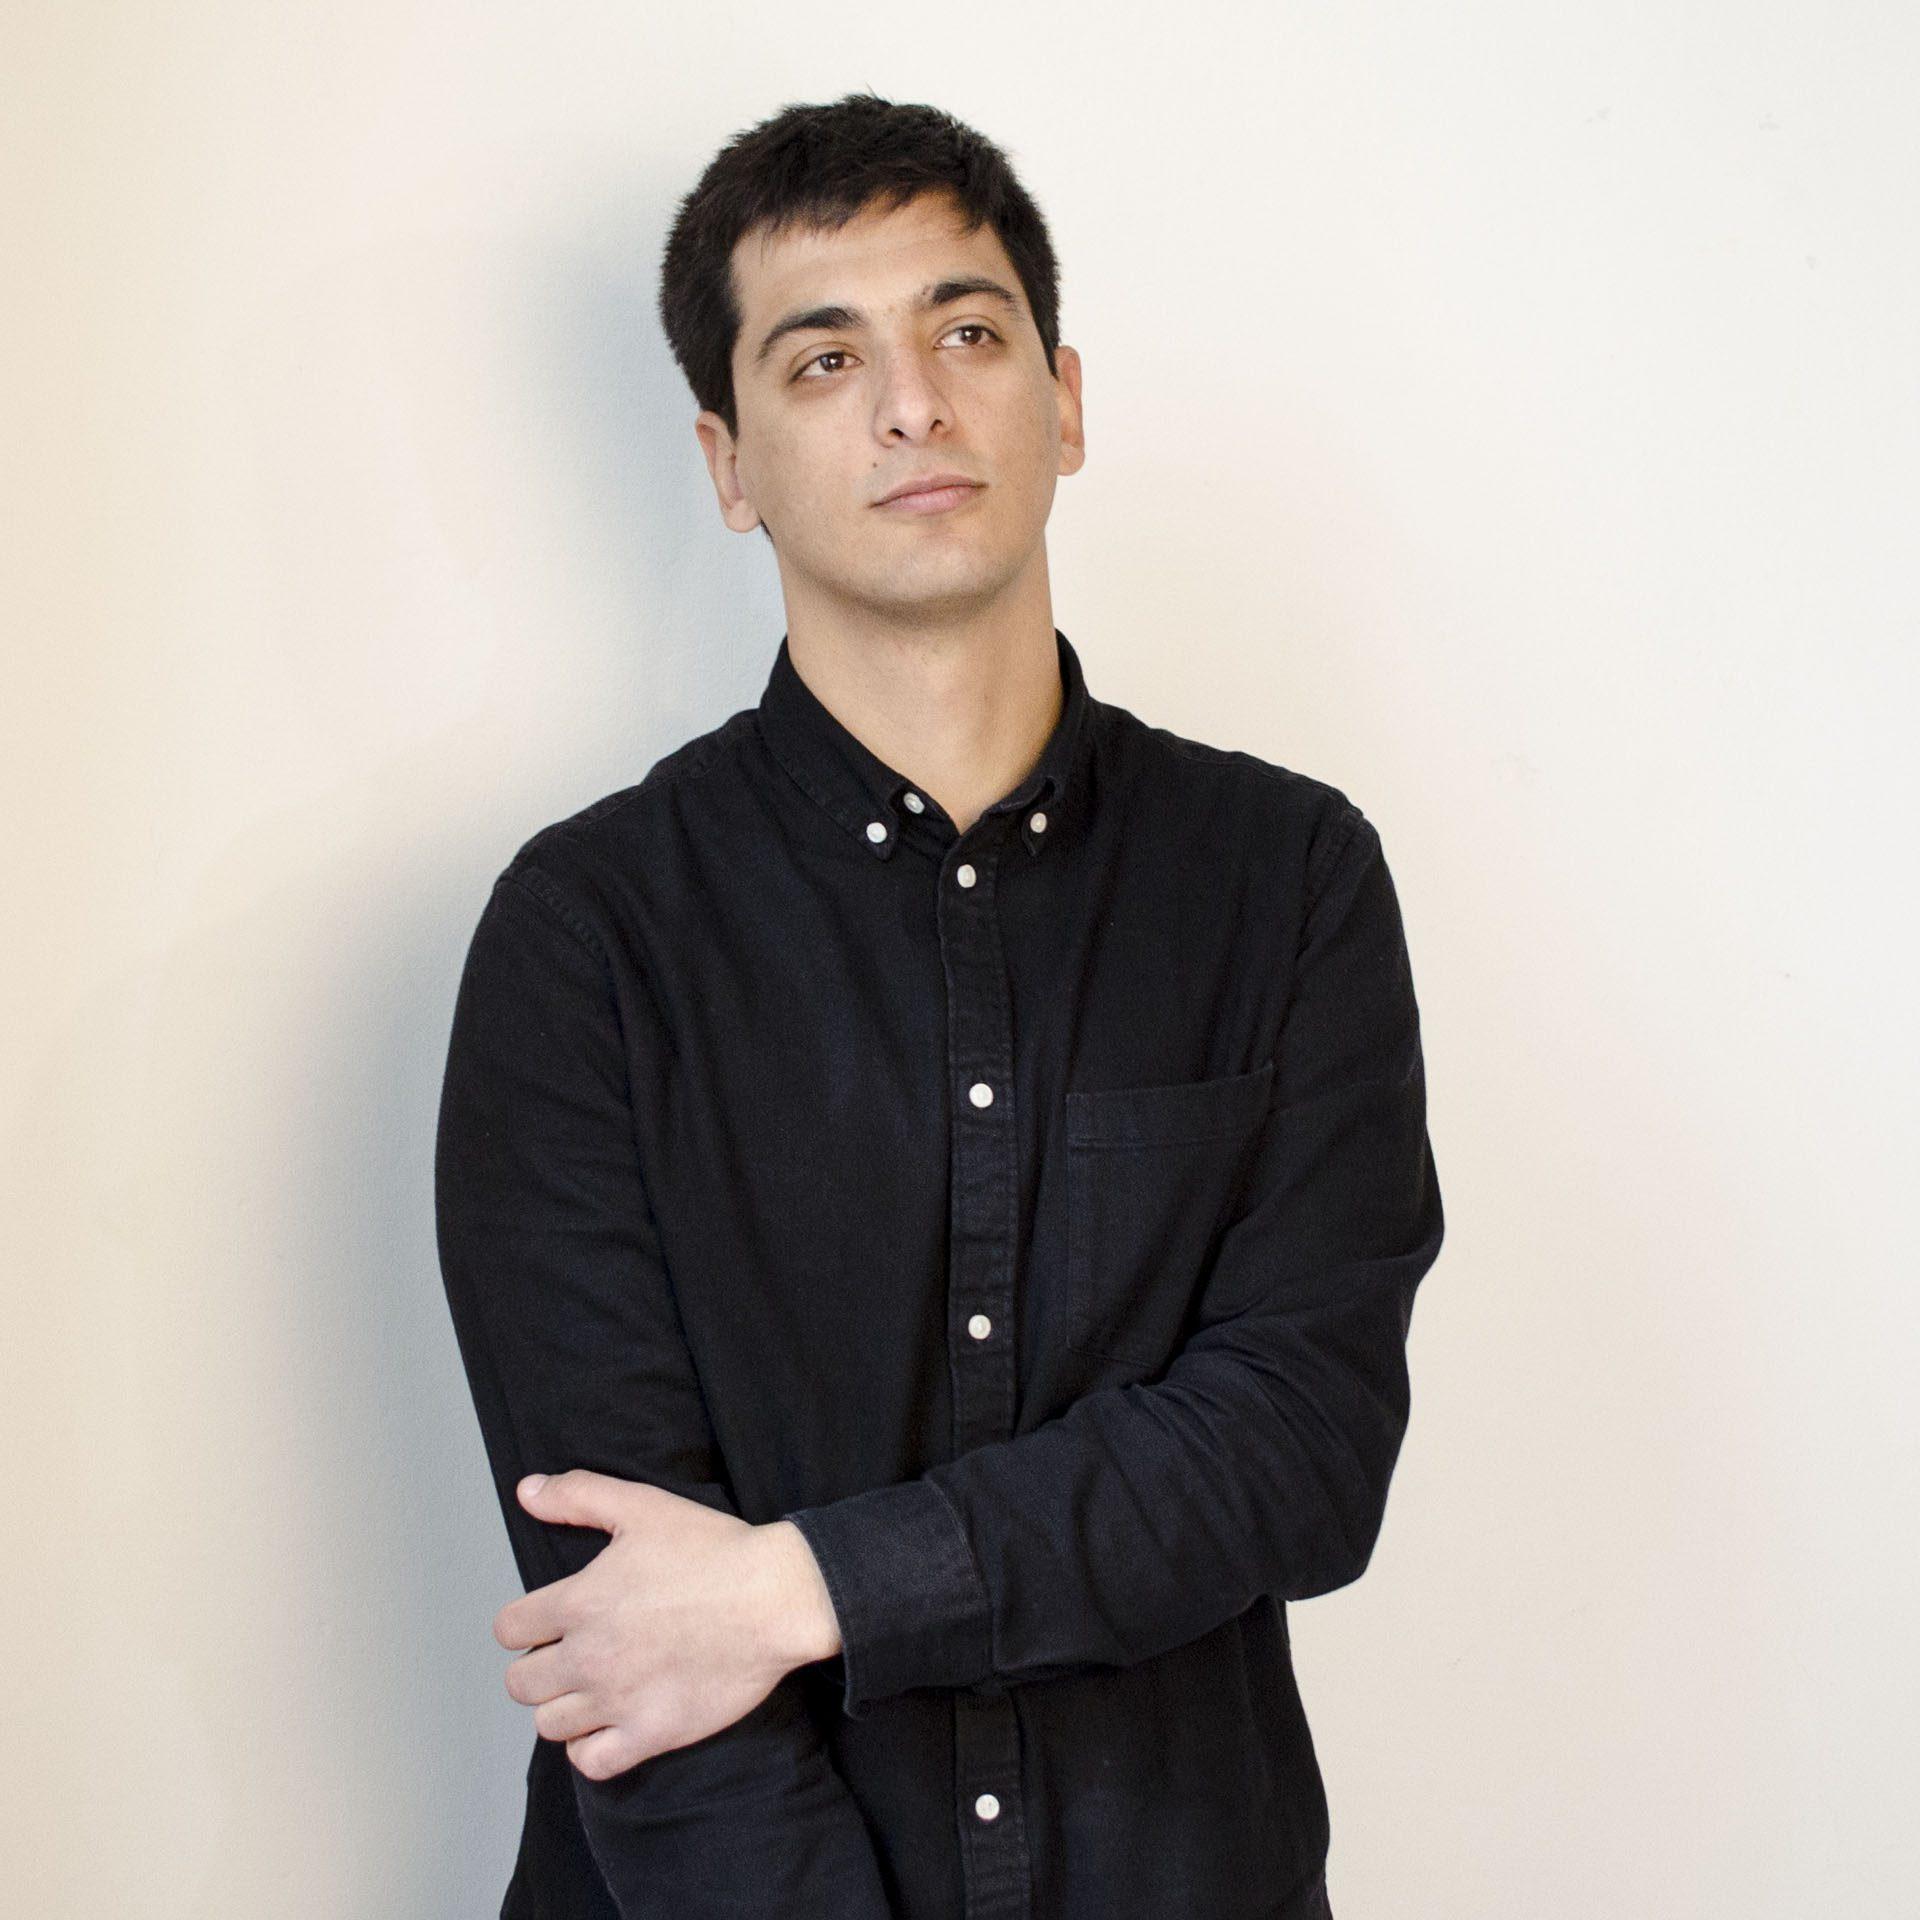 Mauro Cammá